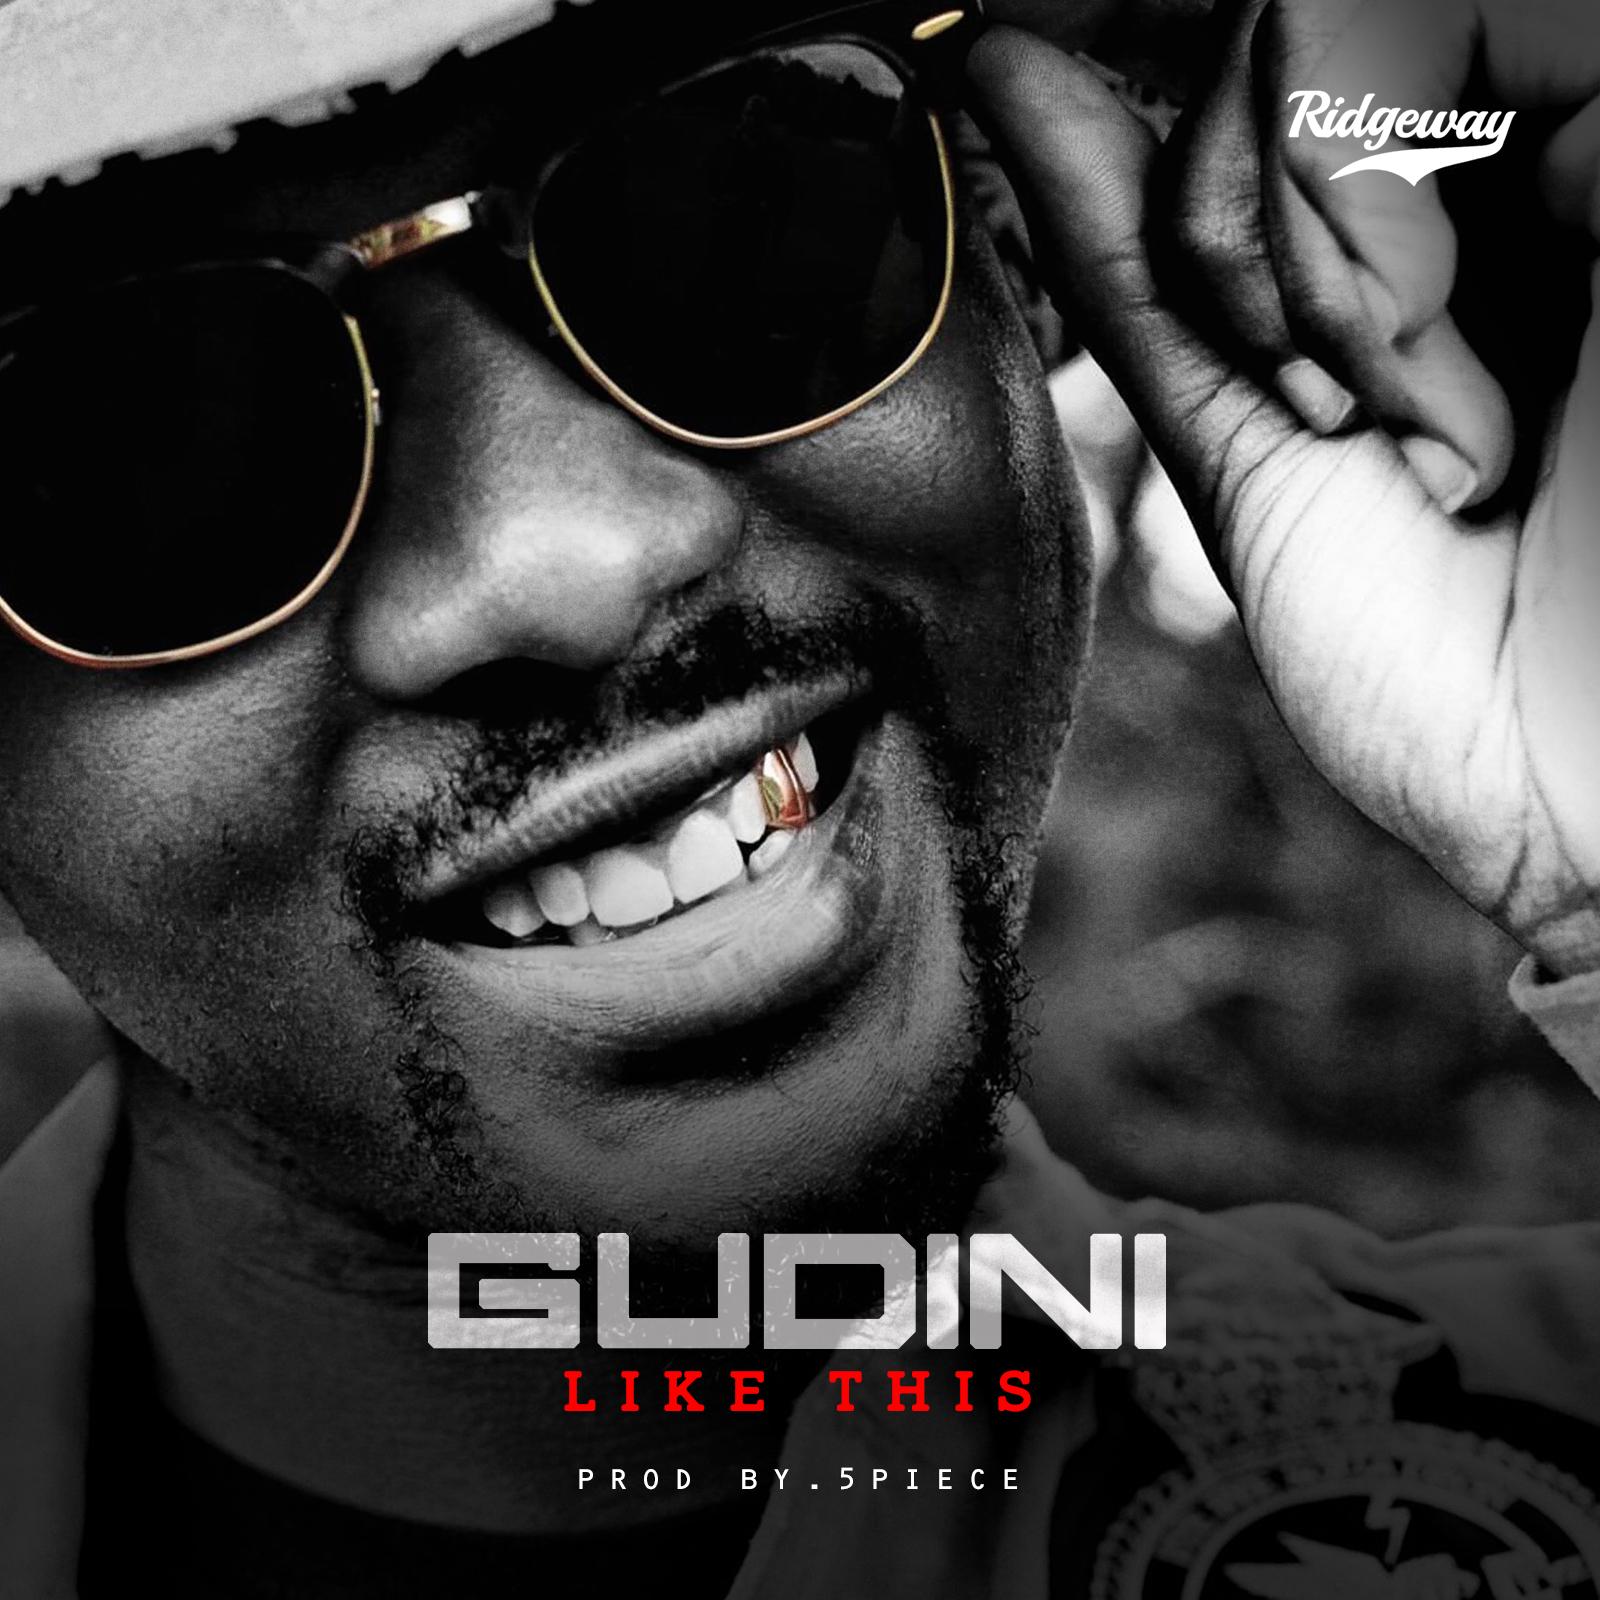 Gudini - Like This